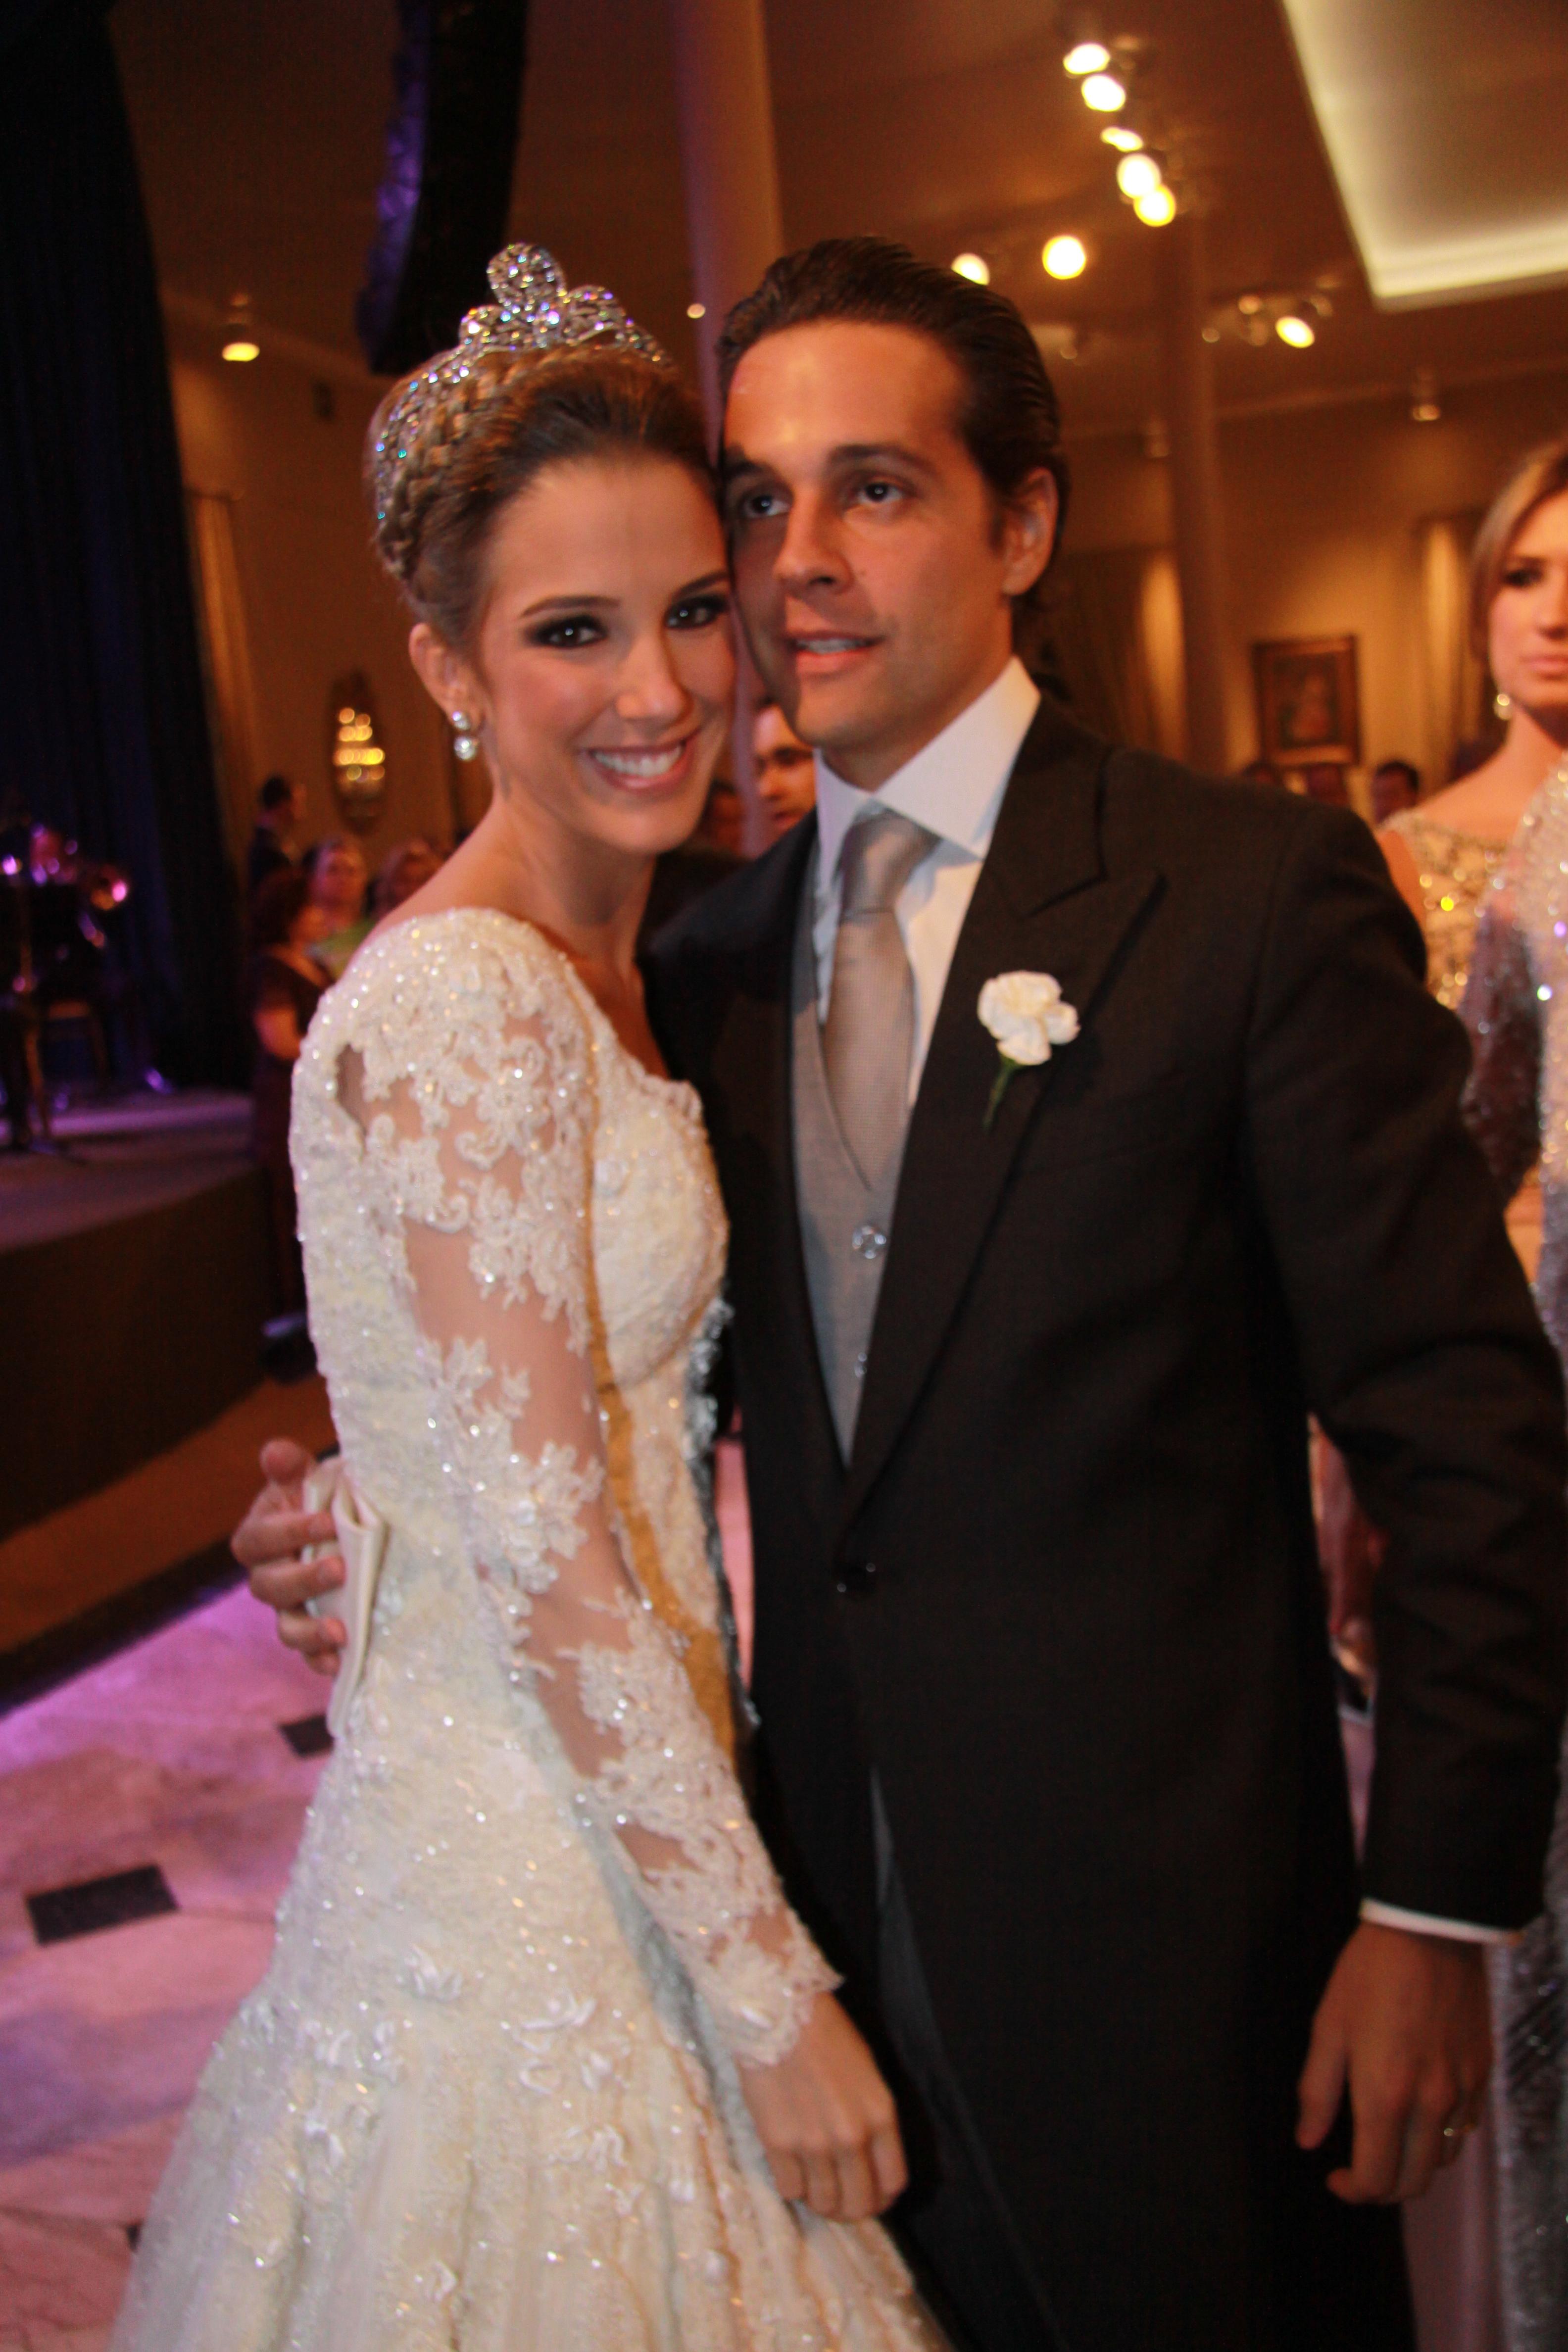 tamara41 O incrível casamento Rudge Gontijo em Brasília   Capítulo 1